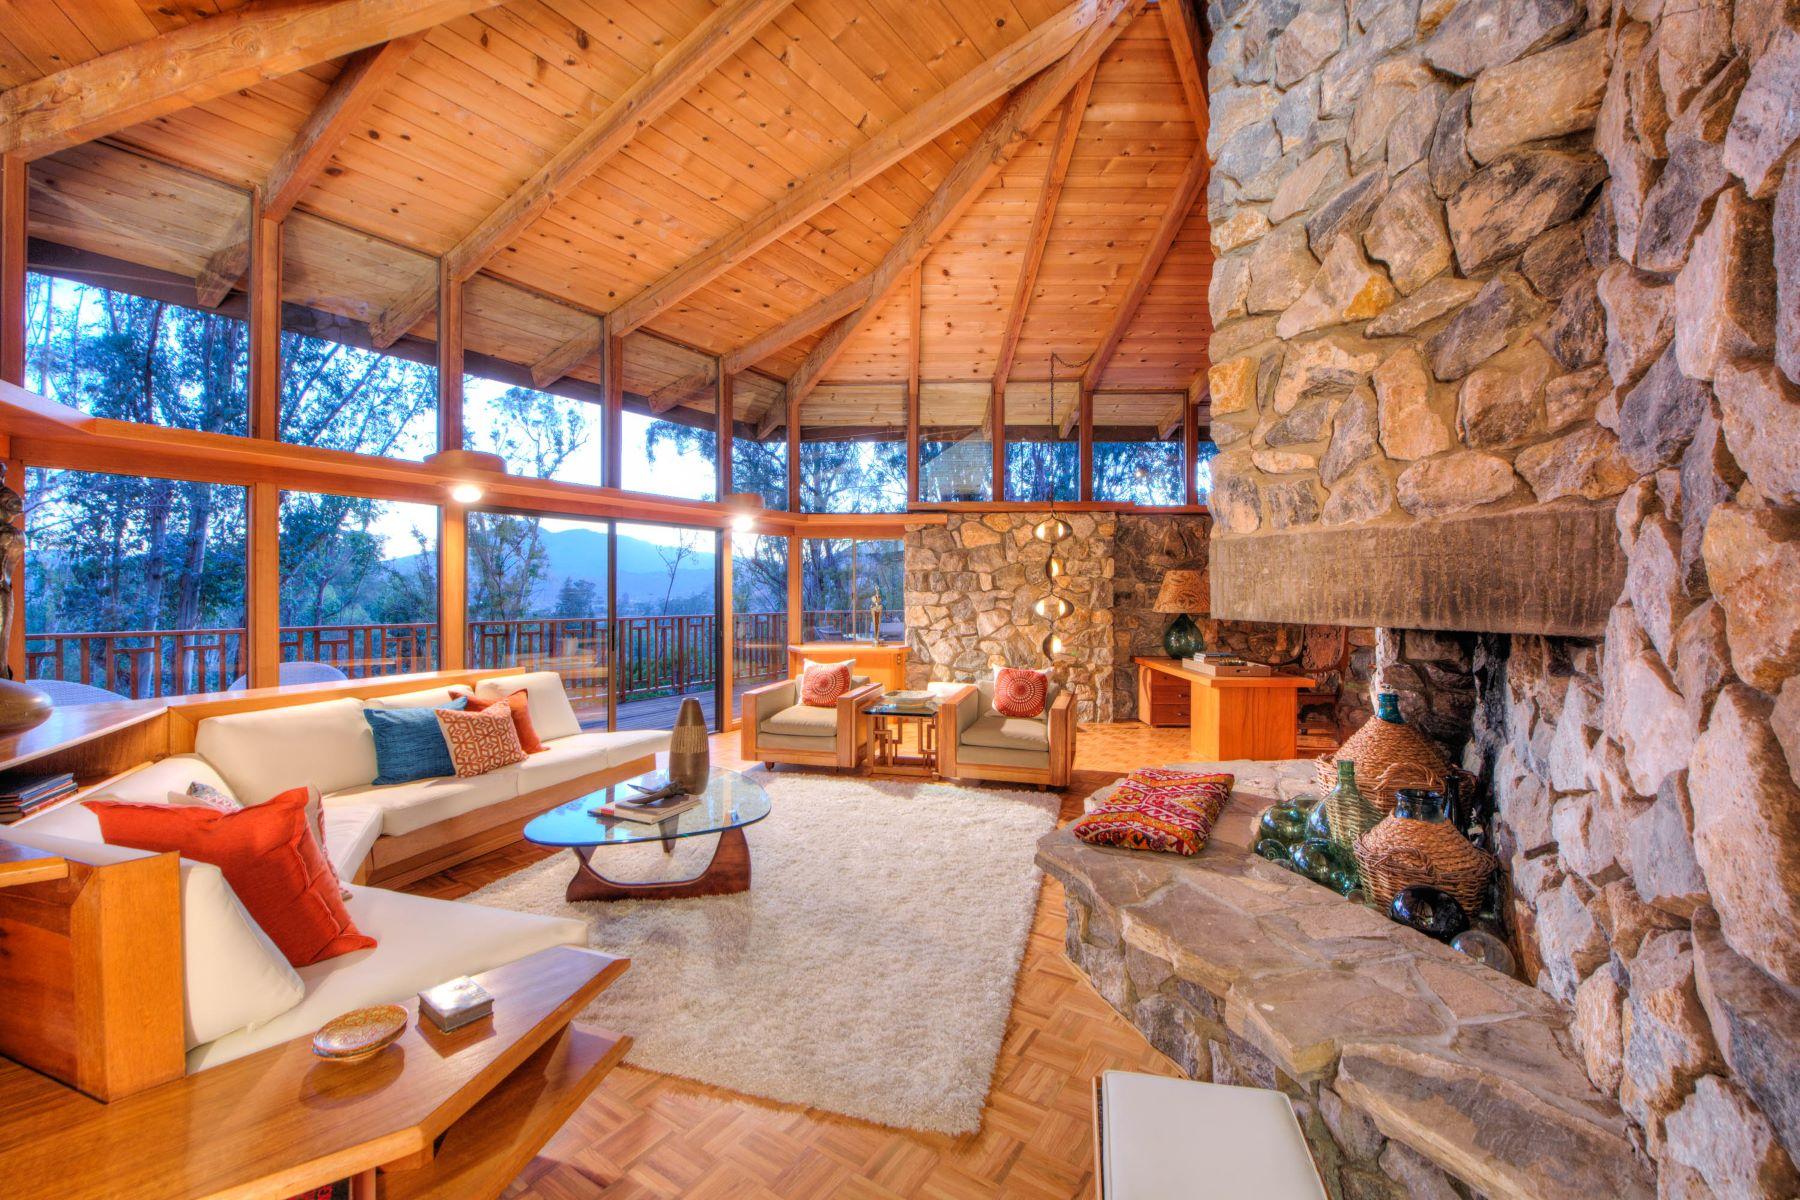 Single Family Home for Sale at Mid-Century Modern Masterpiece on 4+ Acres 215 Locust Avenue San Rafael, California, 94901 United States